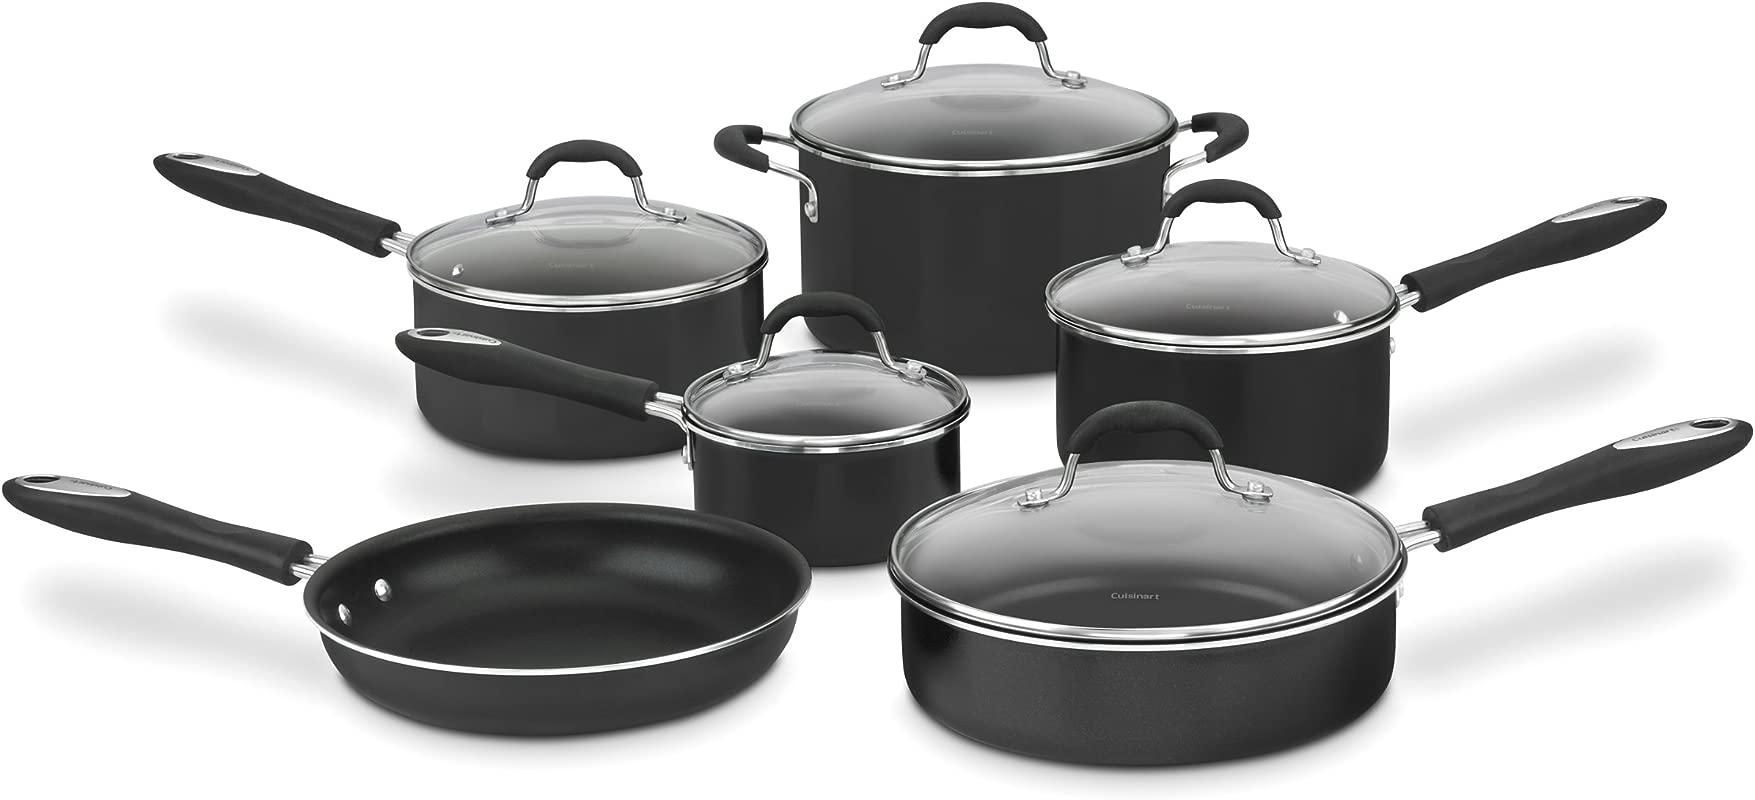 Cuisinart 55 11BK Advantage Nonstick 11 Piece Cookware Set Black